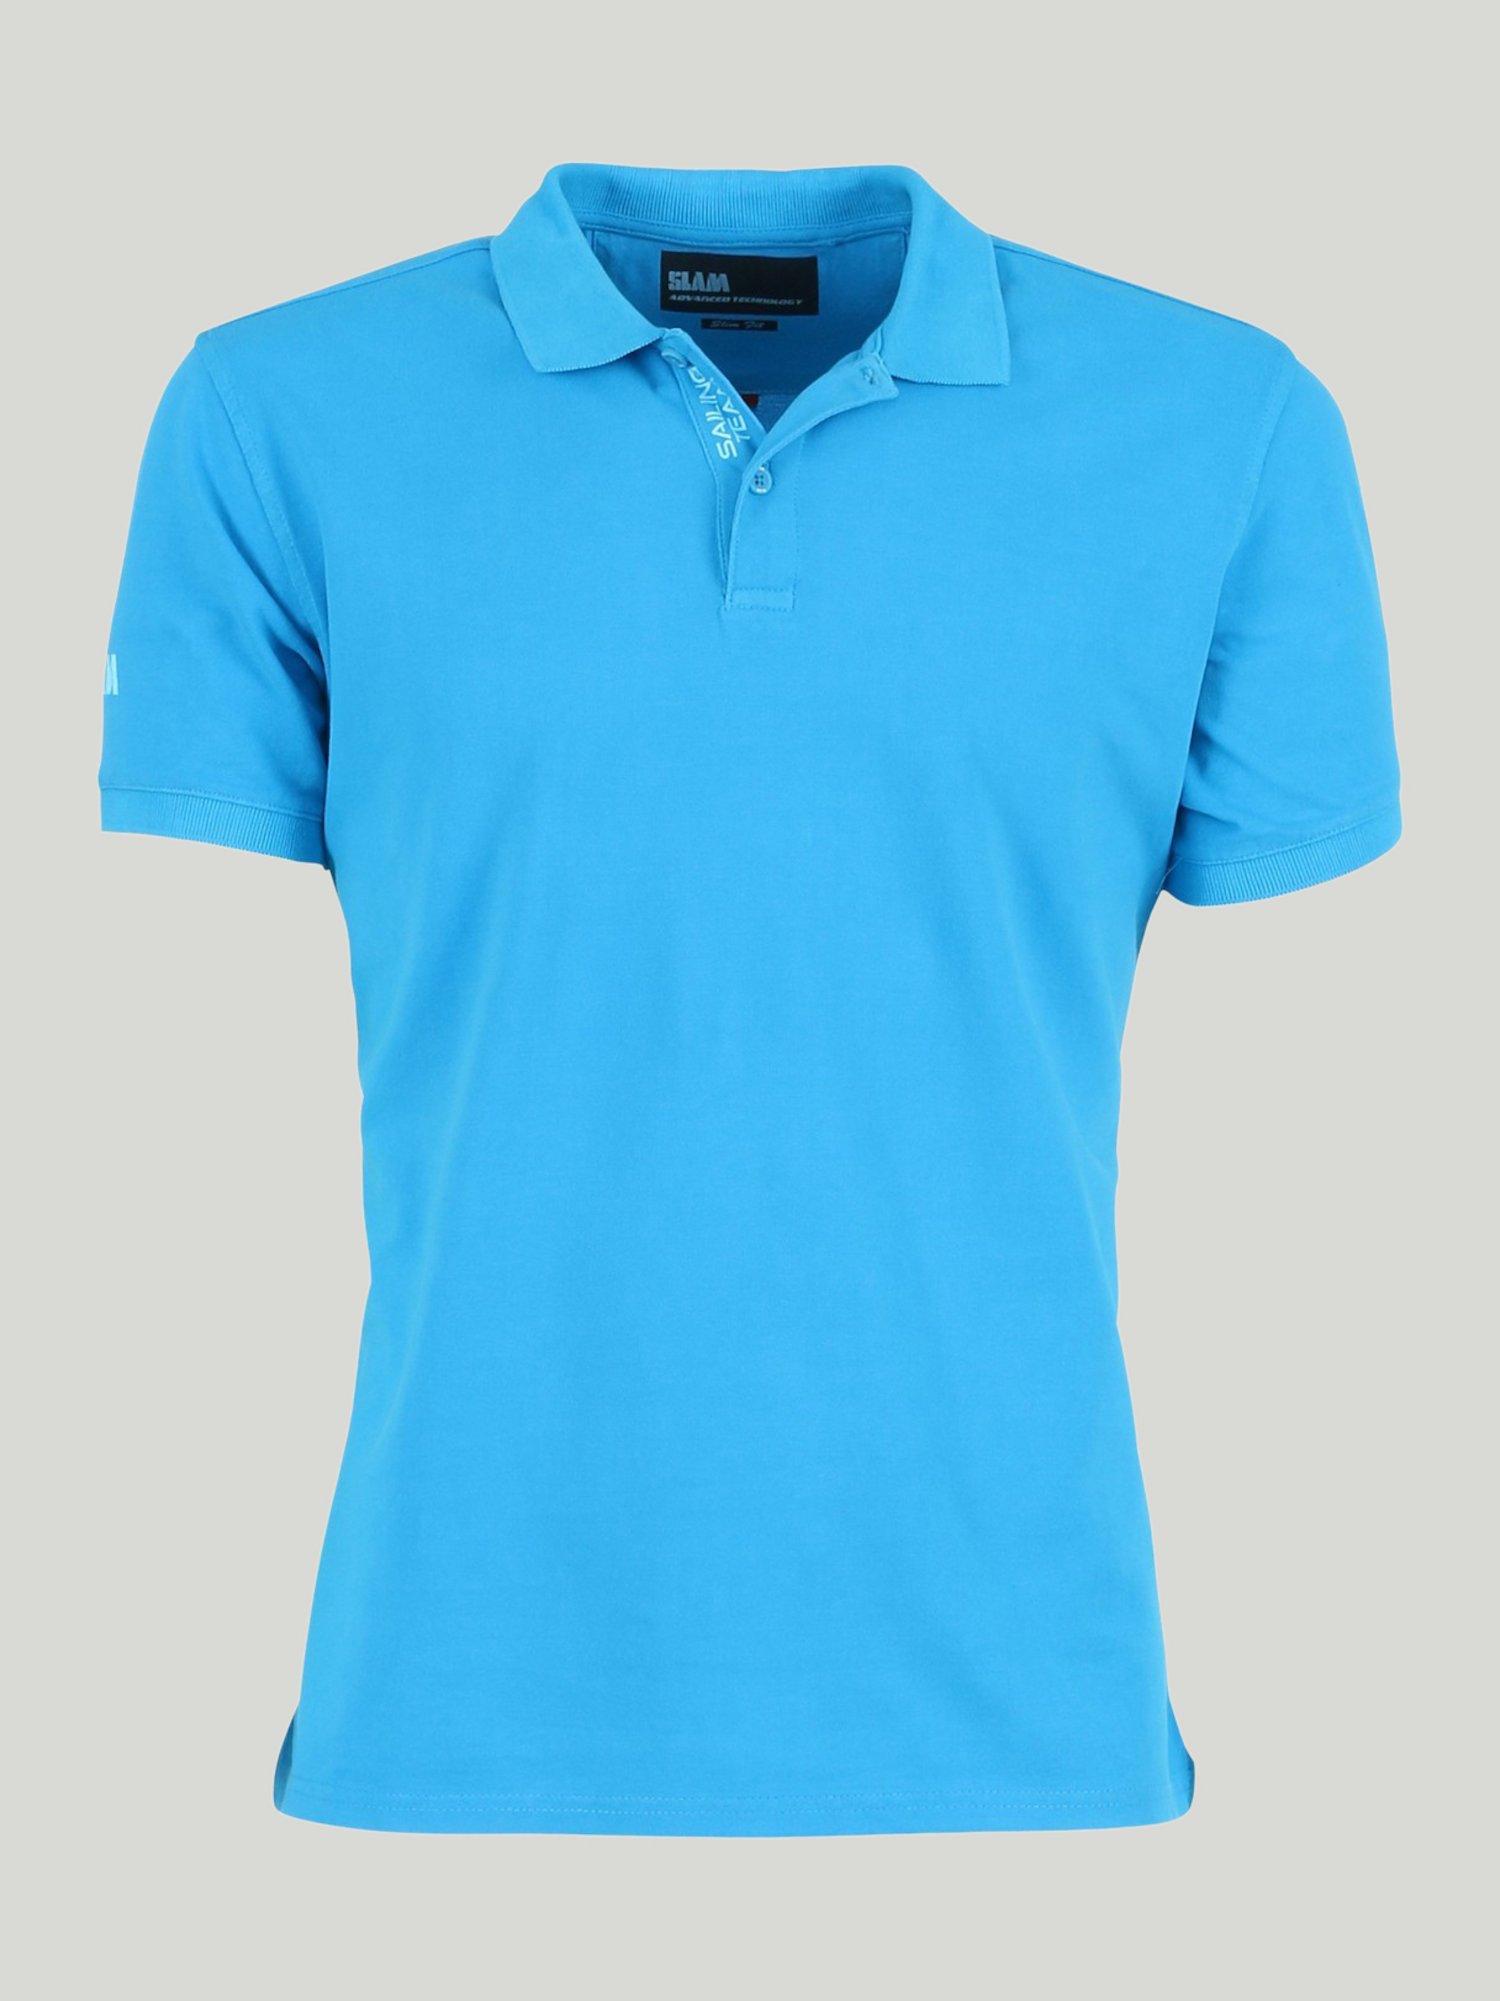 Cutro New polo shirt  - Turquoise Neon